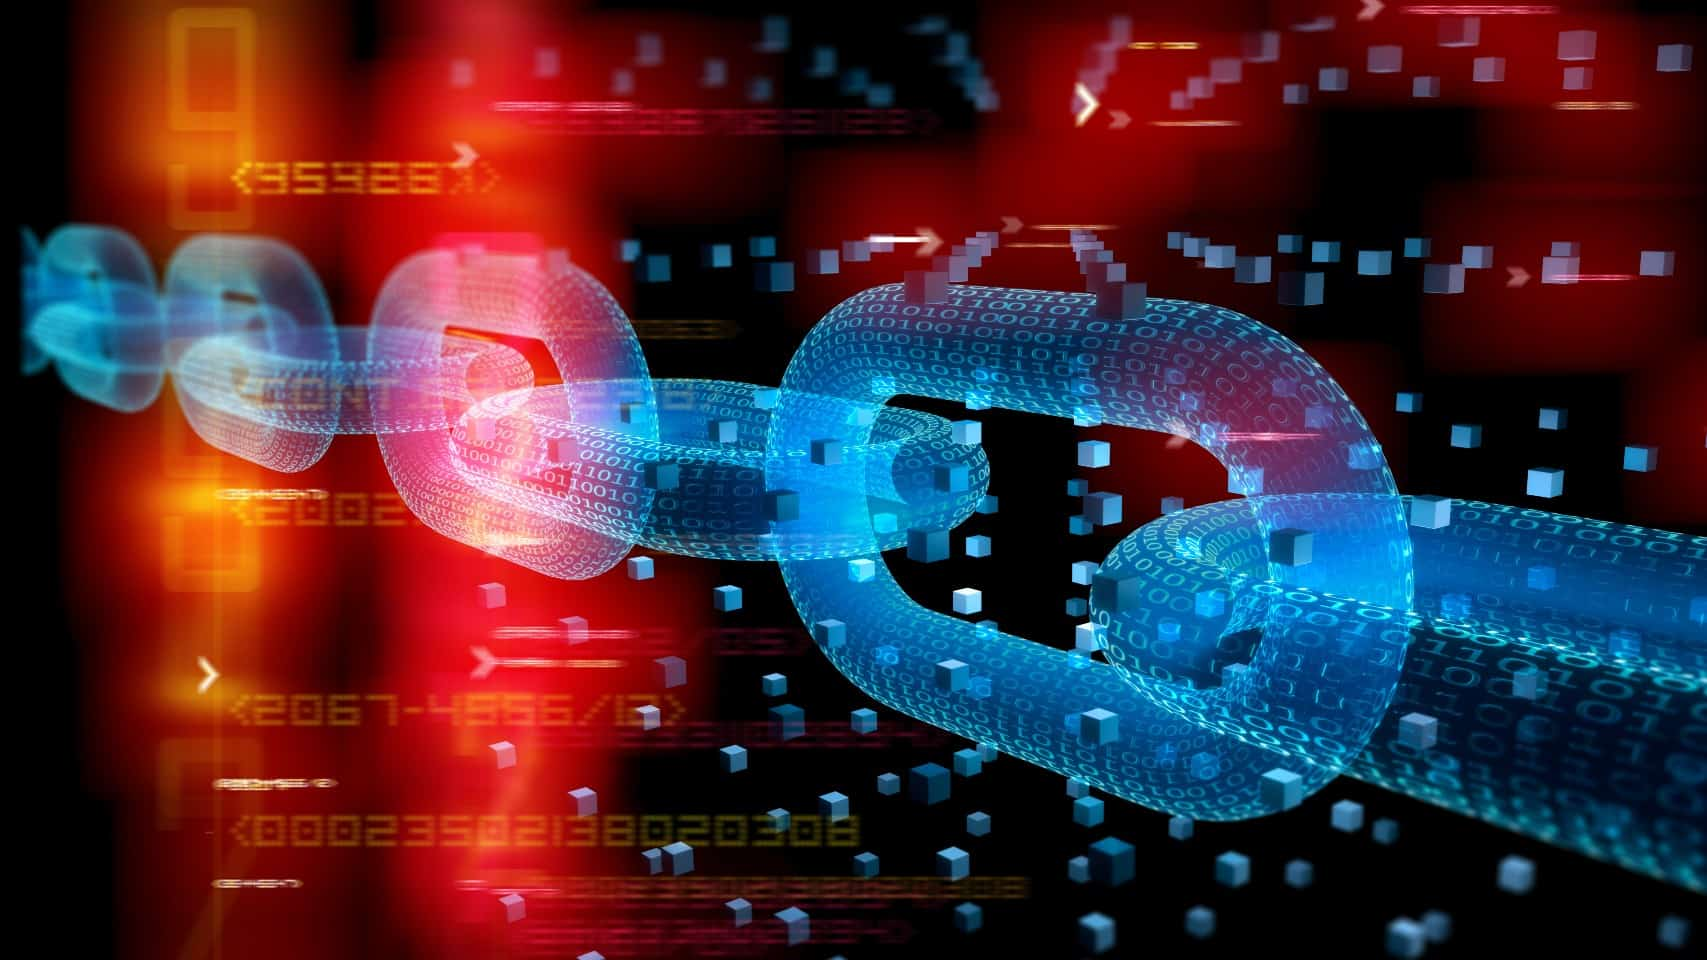 Graphic image depicting blockchain technology